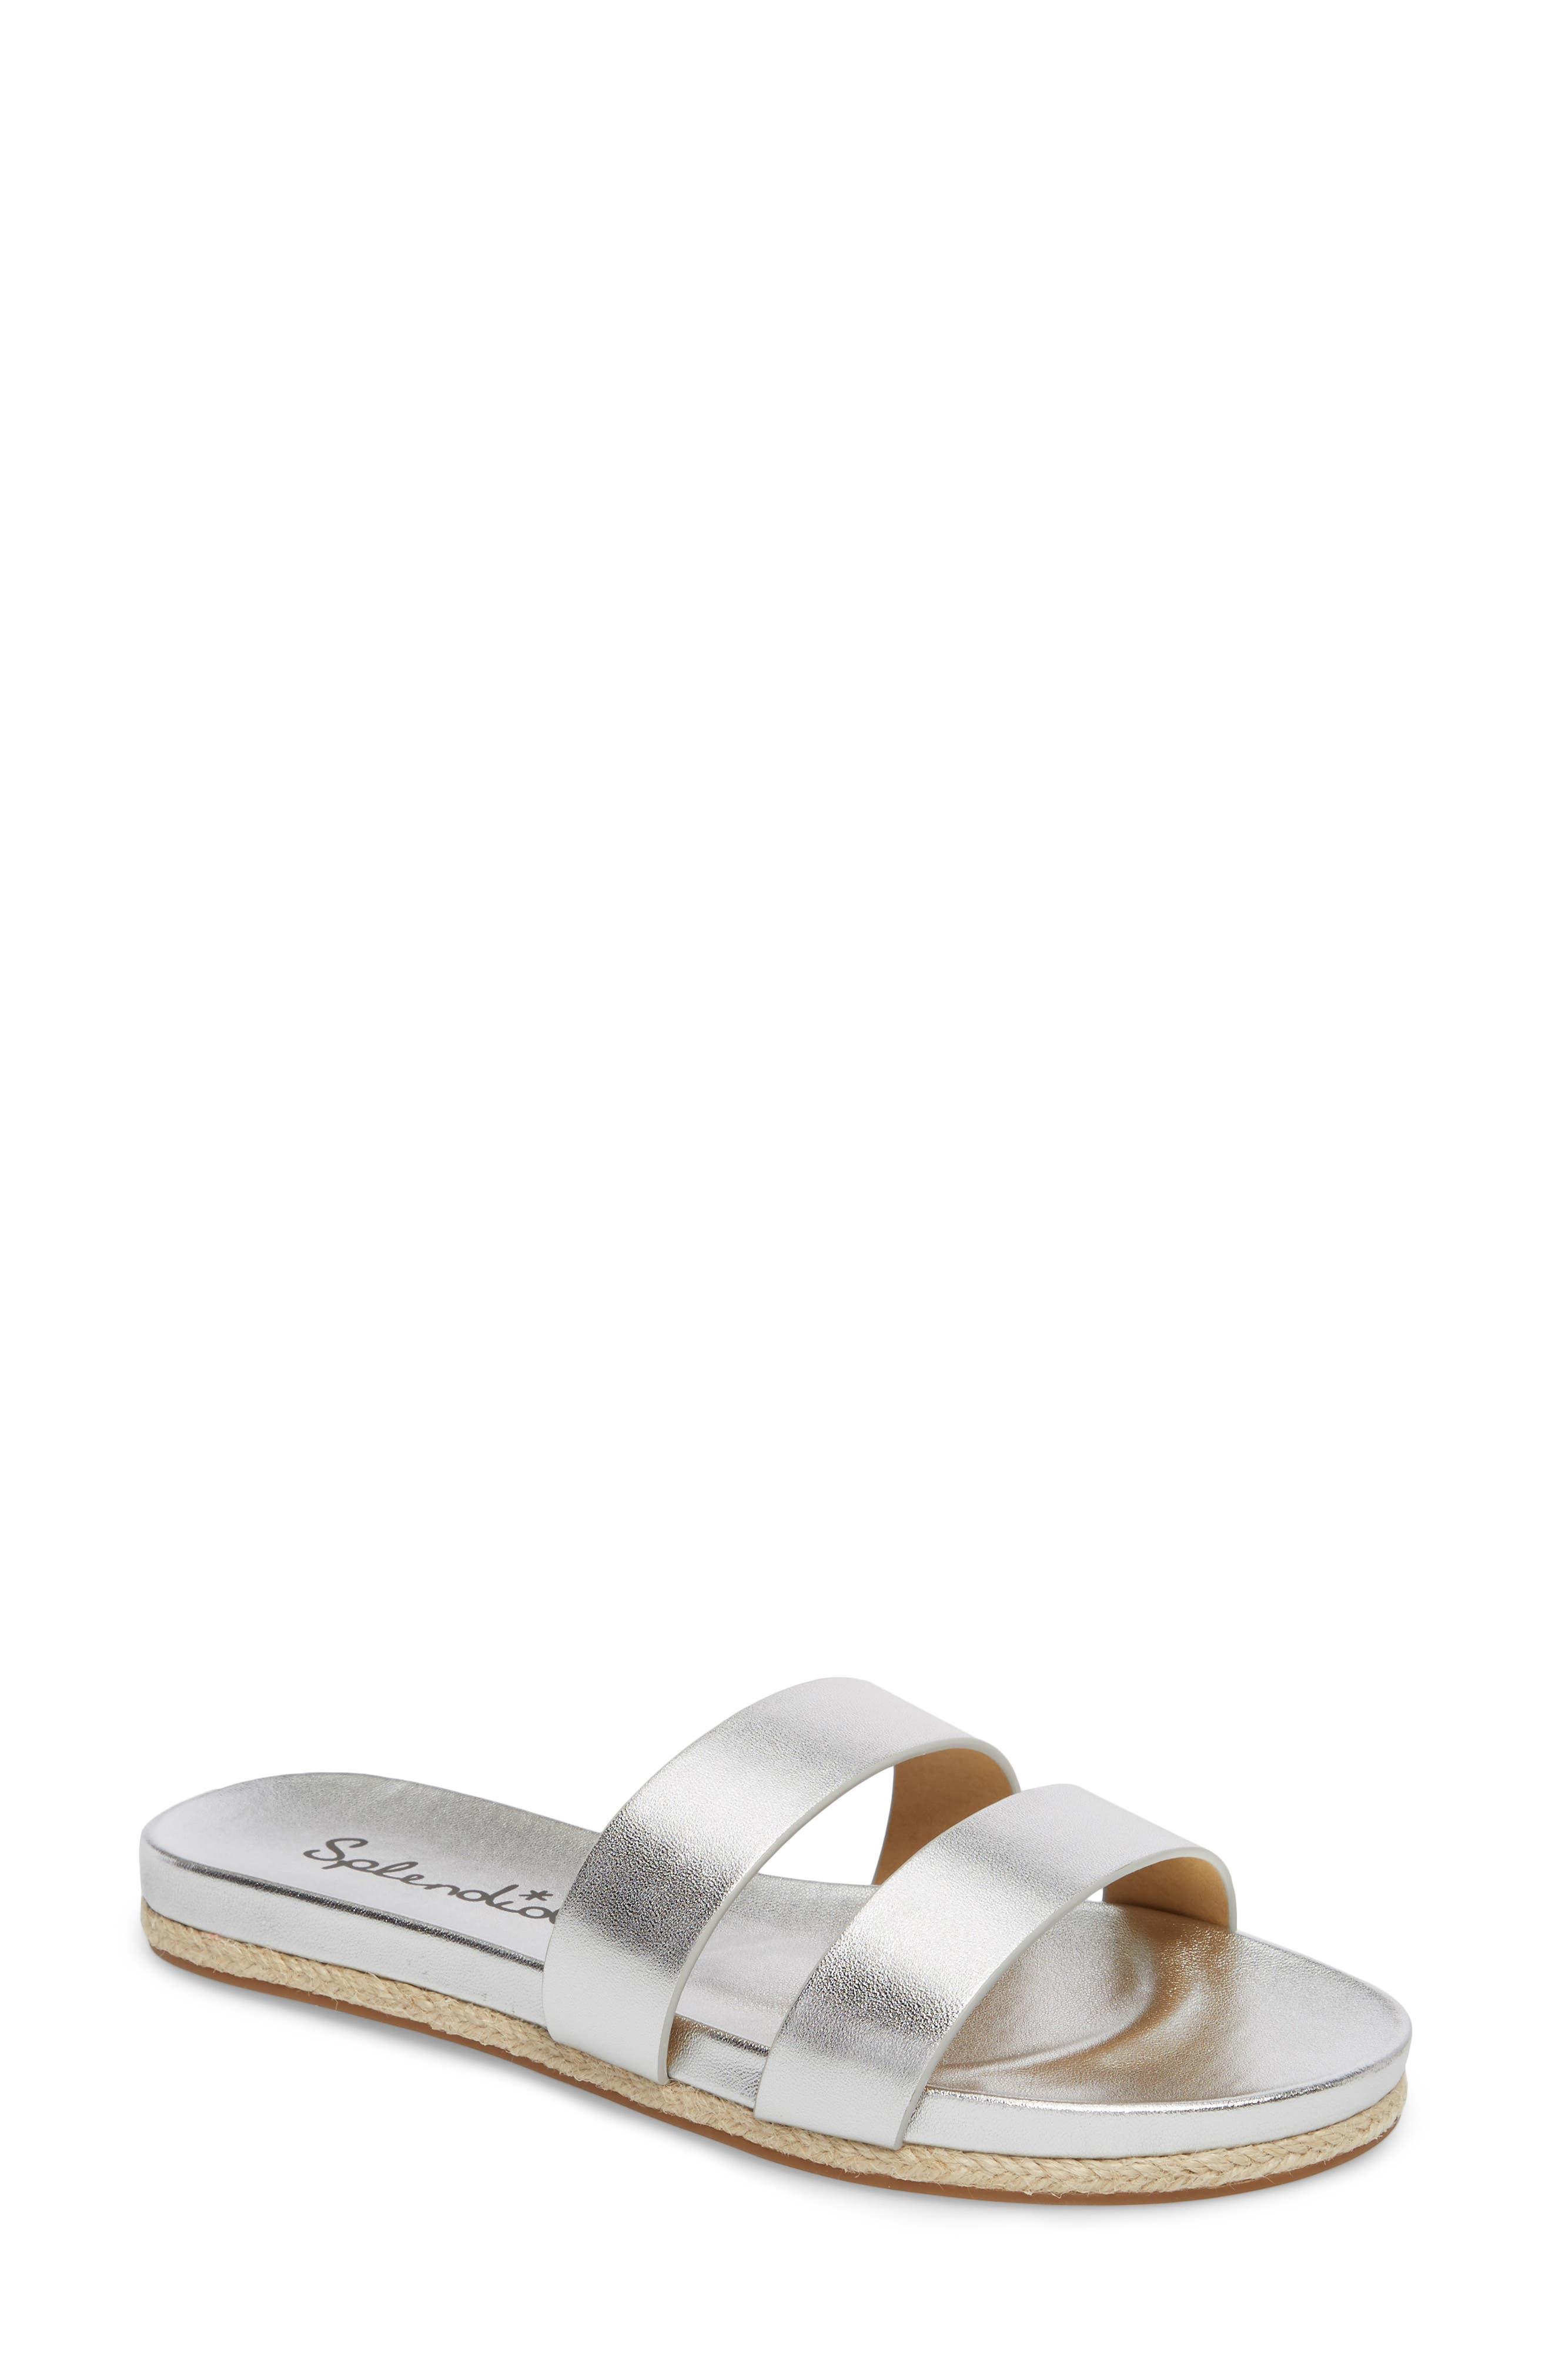 Brittani Slide Sandal,                             Main thumbnail 1, color,                             Silver Metallic Leather